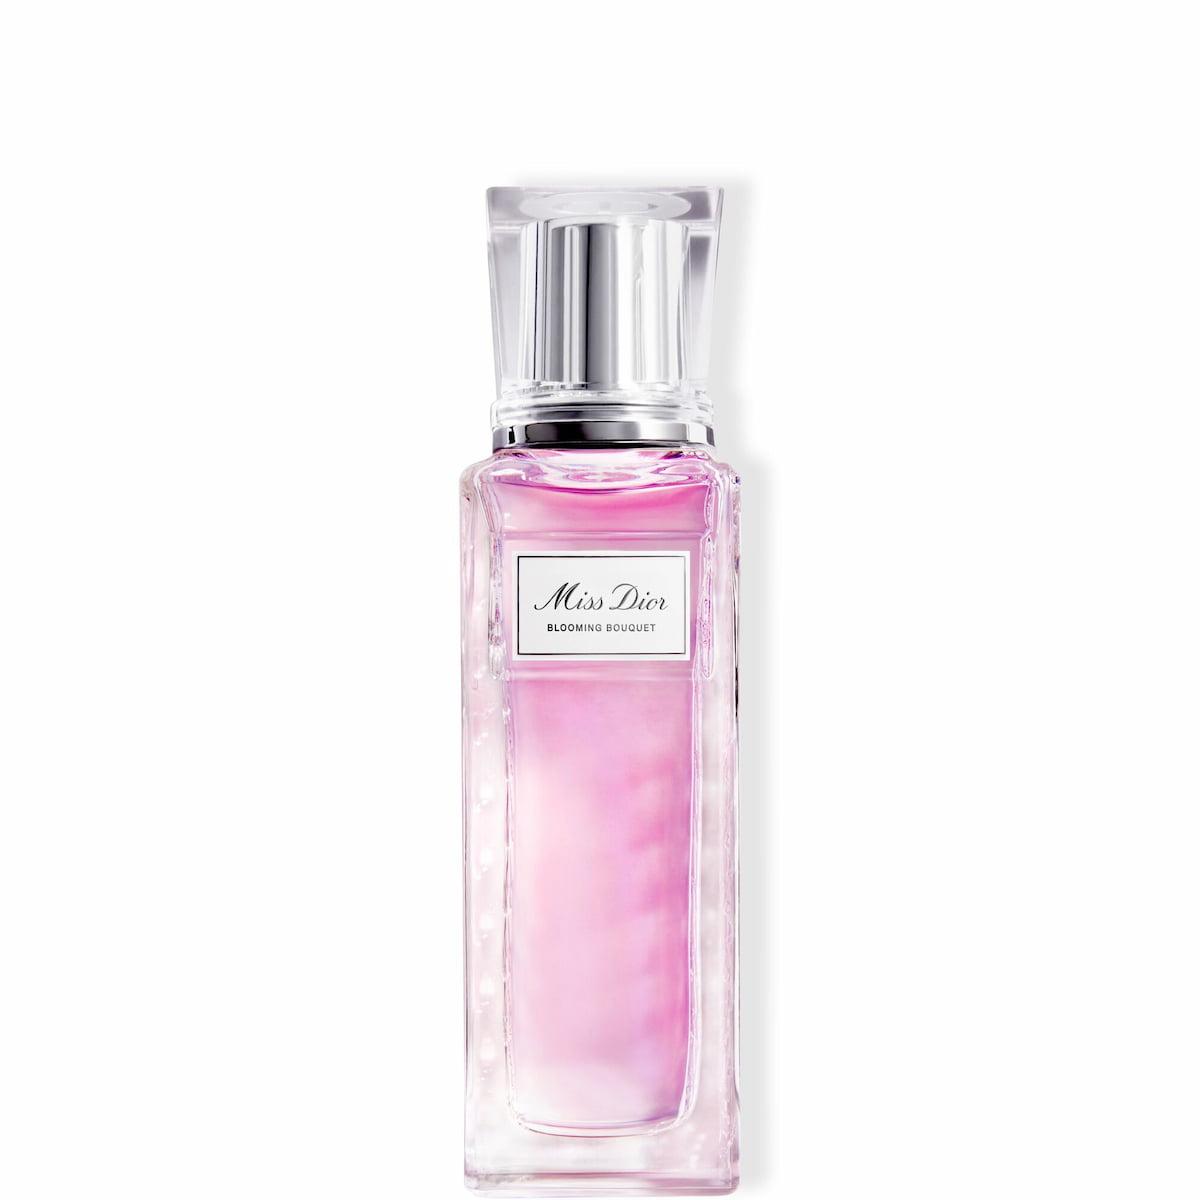 Eau de Toilette Roller-pearl Miss Dior Blooming Bouquet - DIOR